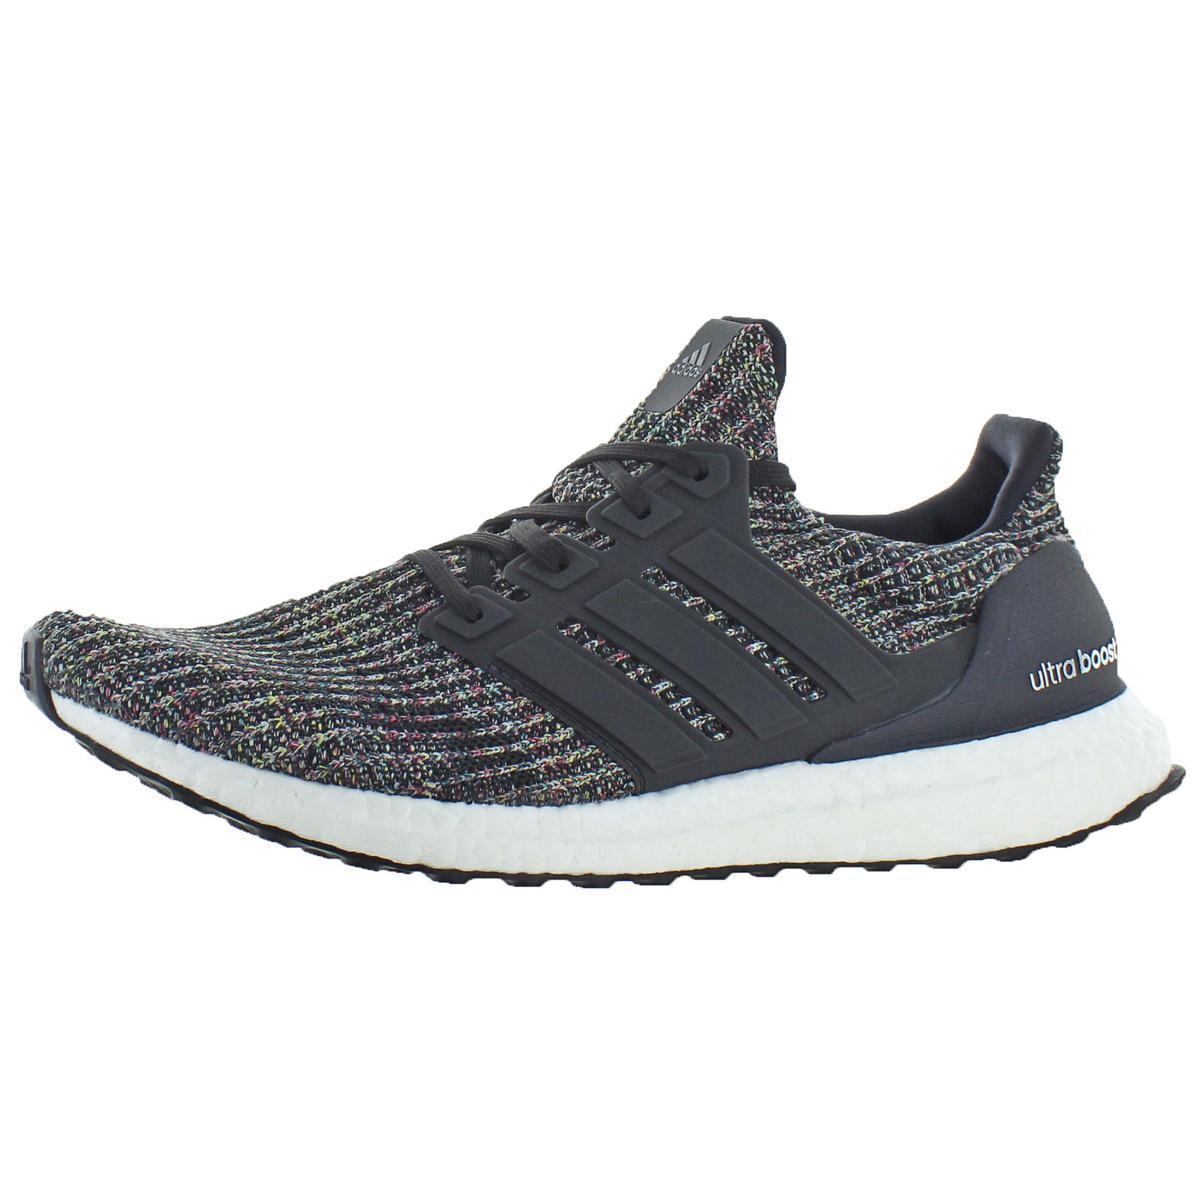 best cheap 528c0 e1c5d Adidas Men s UltraBoost Primeknit Running Shoes Sneakers   eBay